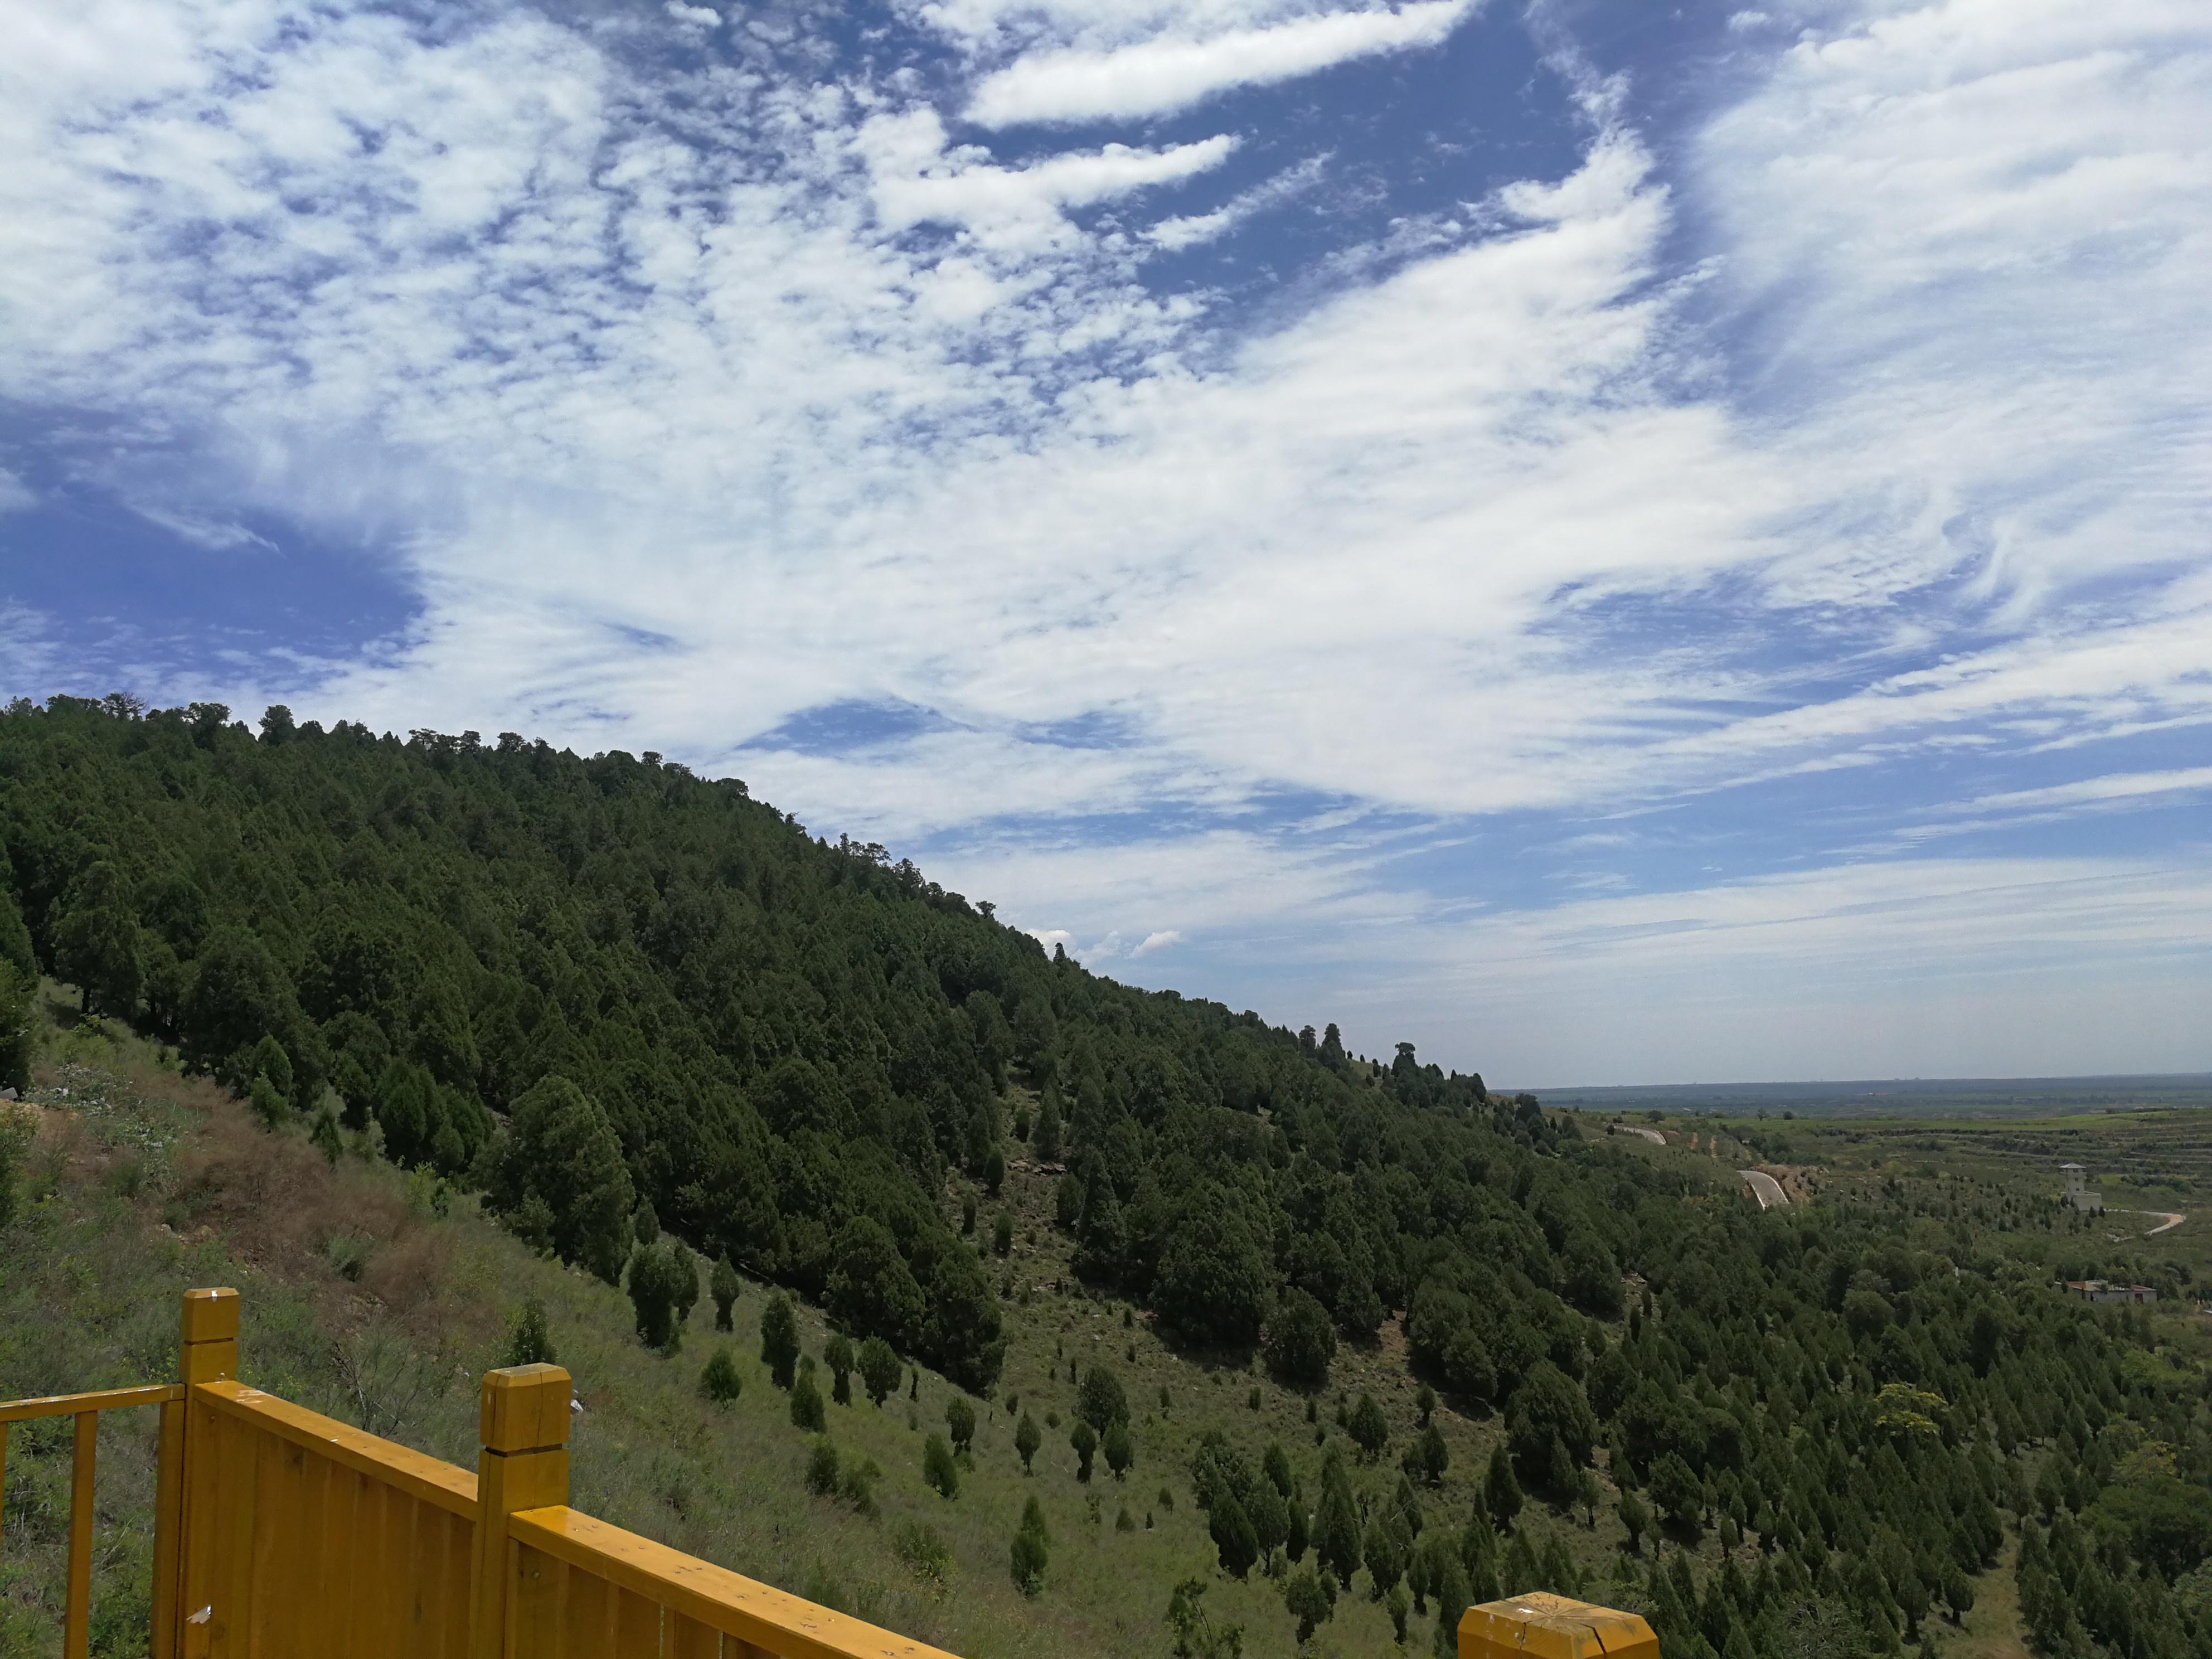 Huti Mountain